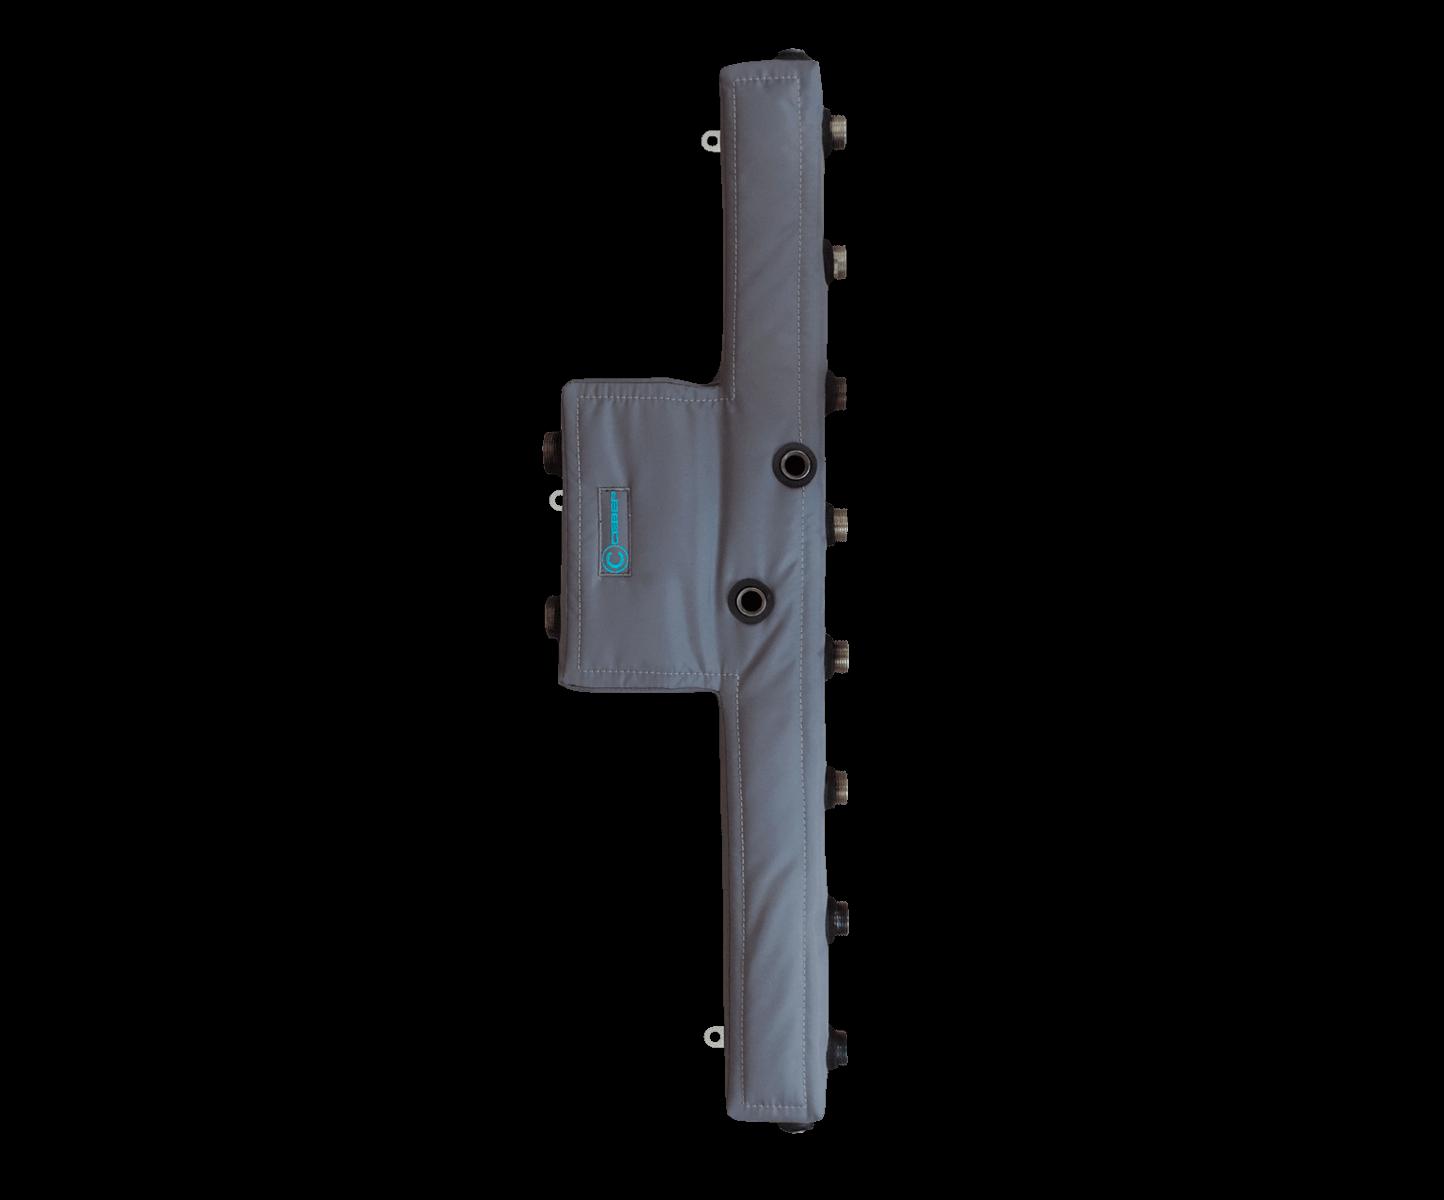 Теплоизоляция, теплоизоляционный чехол для гидрообвязки Север V4